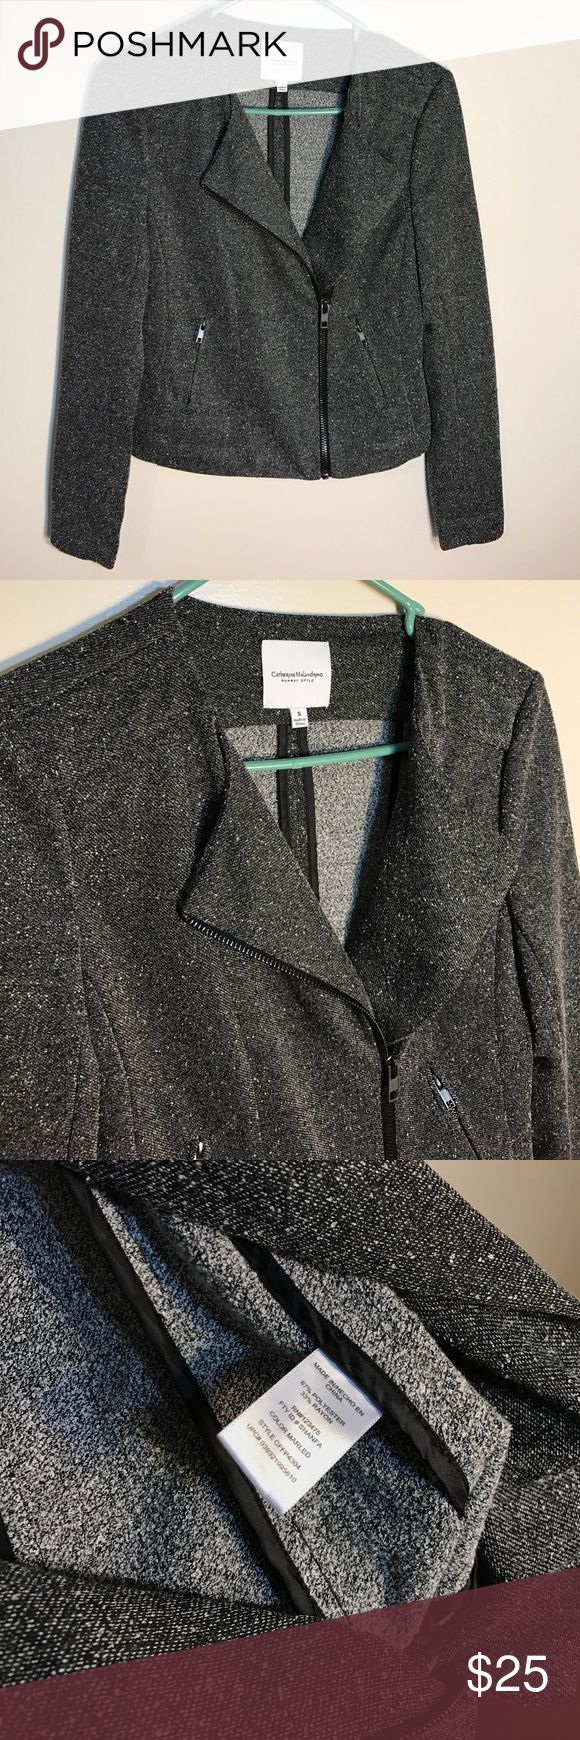 Catherine Malandrino Runway Style Jacket New without tags Catherine Malandrino Jackets & Coats Blazers